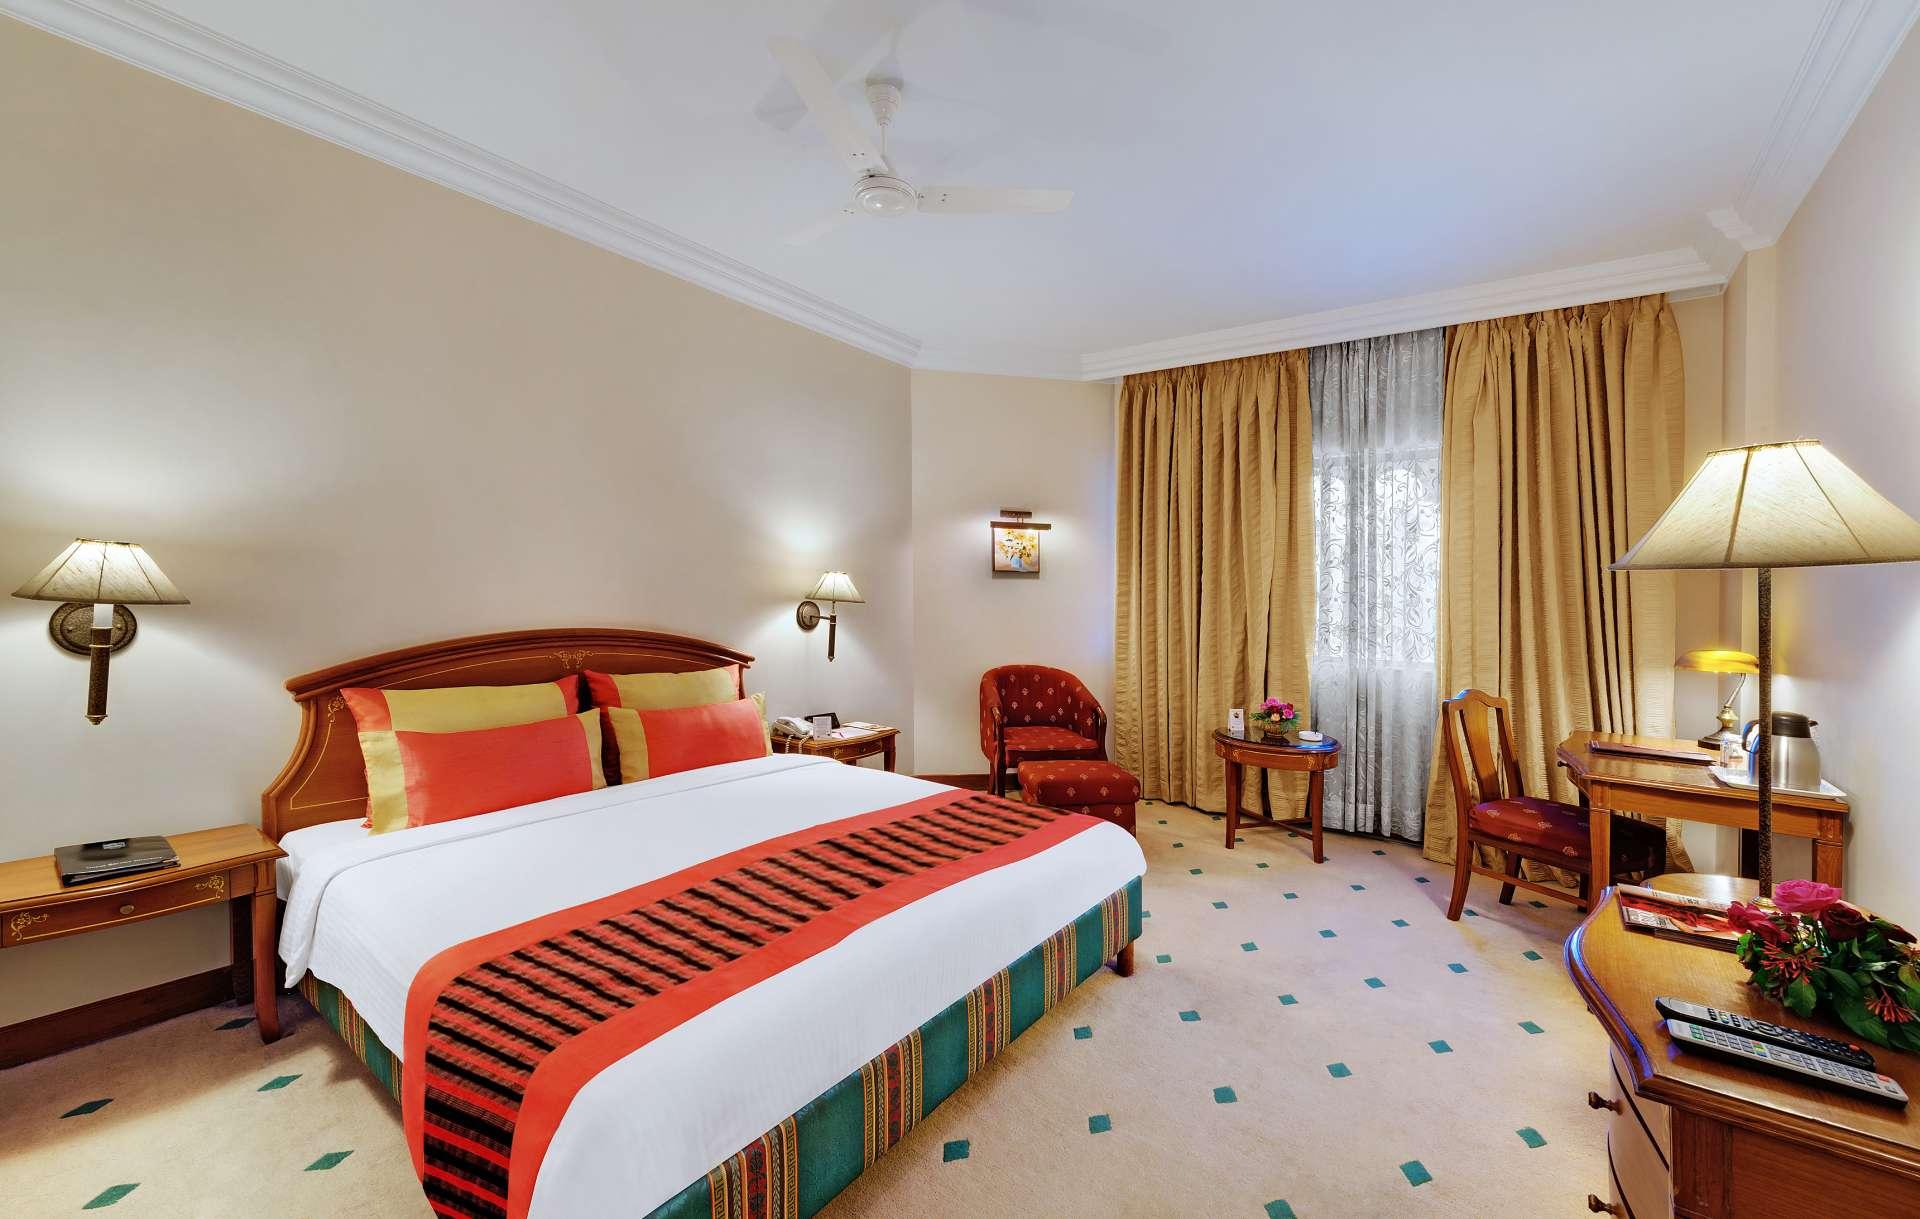 executive room 1 ambassador ajanta aurangabad - The Ambassador | Heritage Hotels in Mumbai, Aurangabad, Chennai - Our Rooms